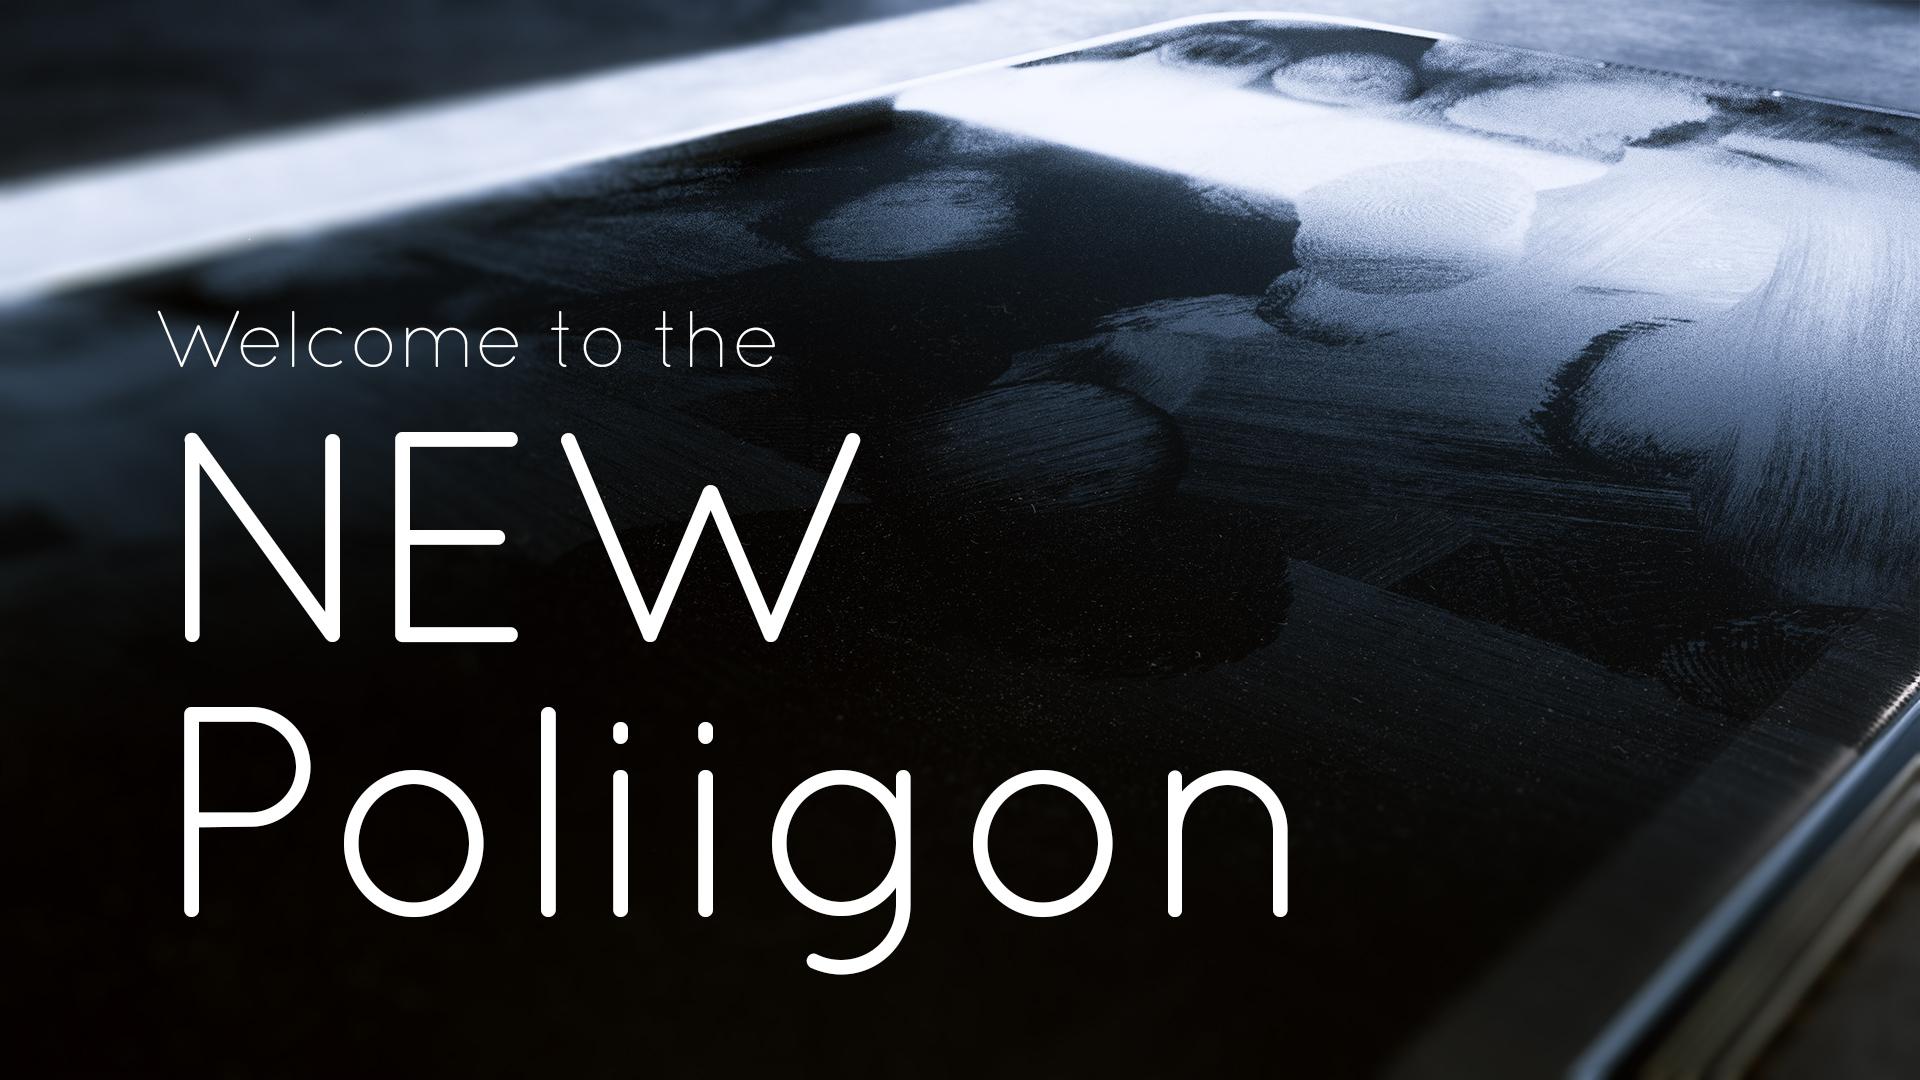 new poliigon banner.jpg